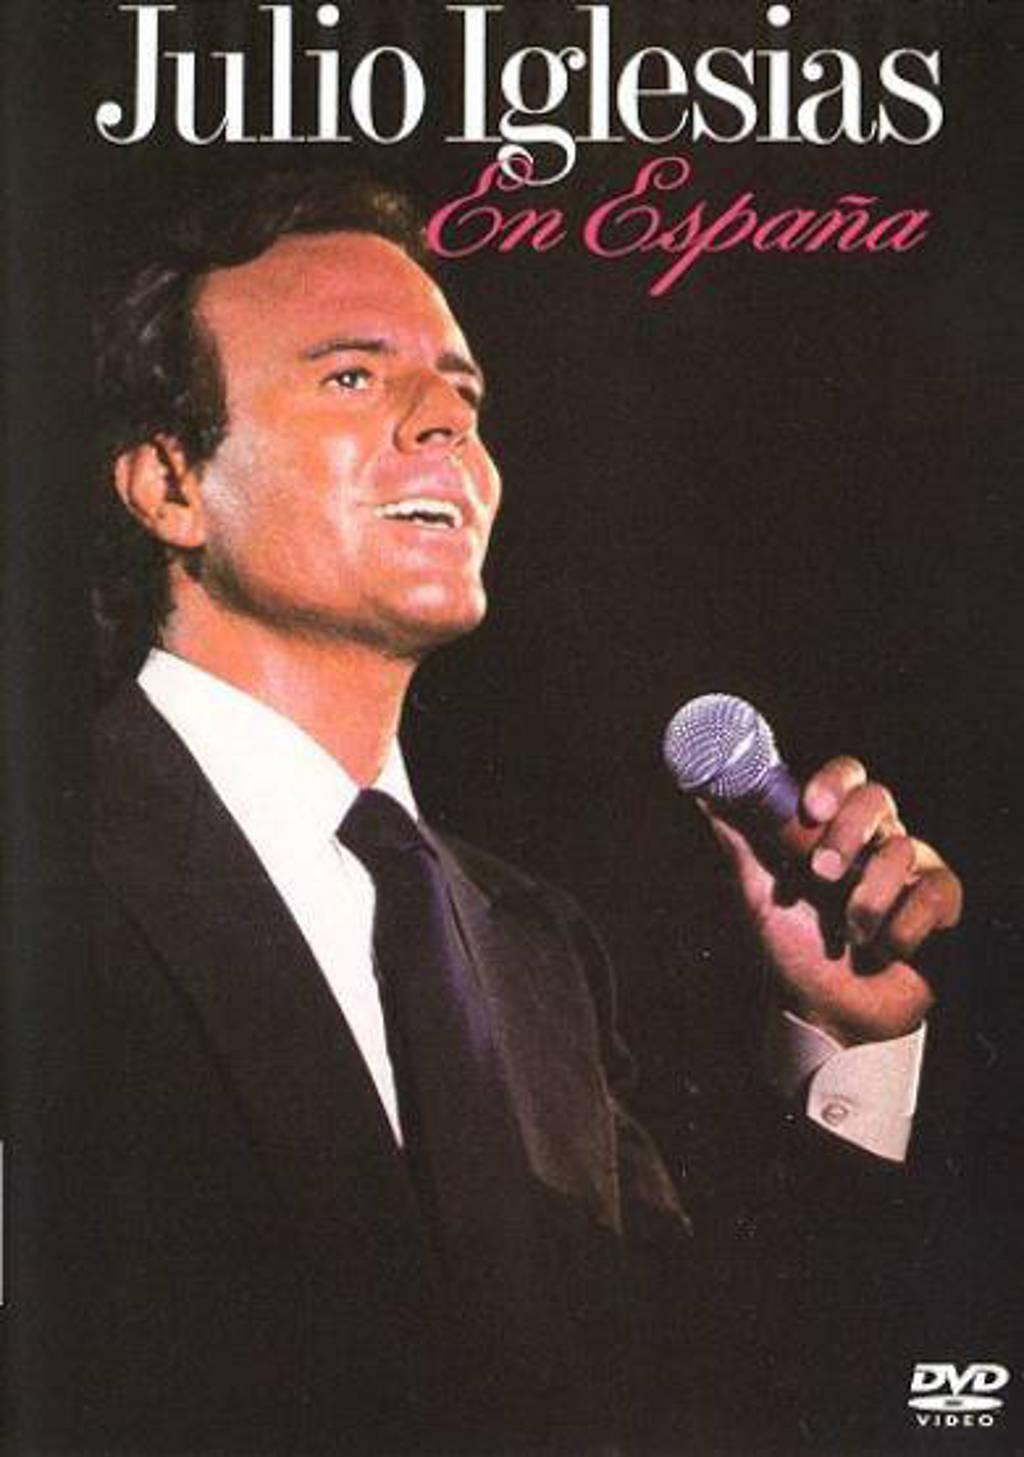 Julio Iglesias - en Espana (DVD)